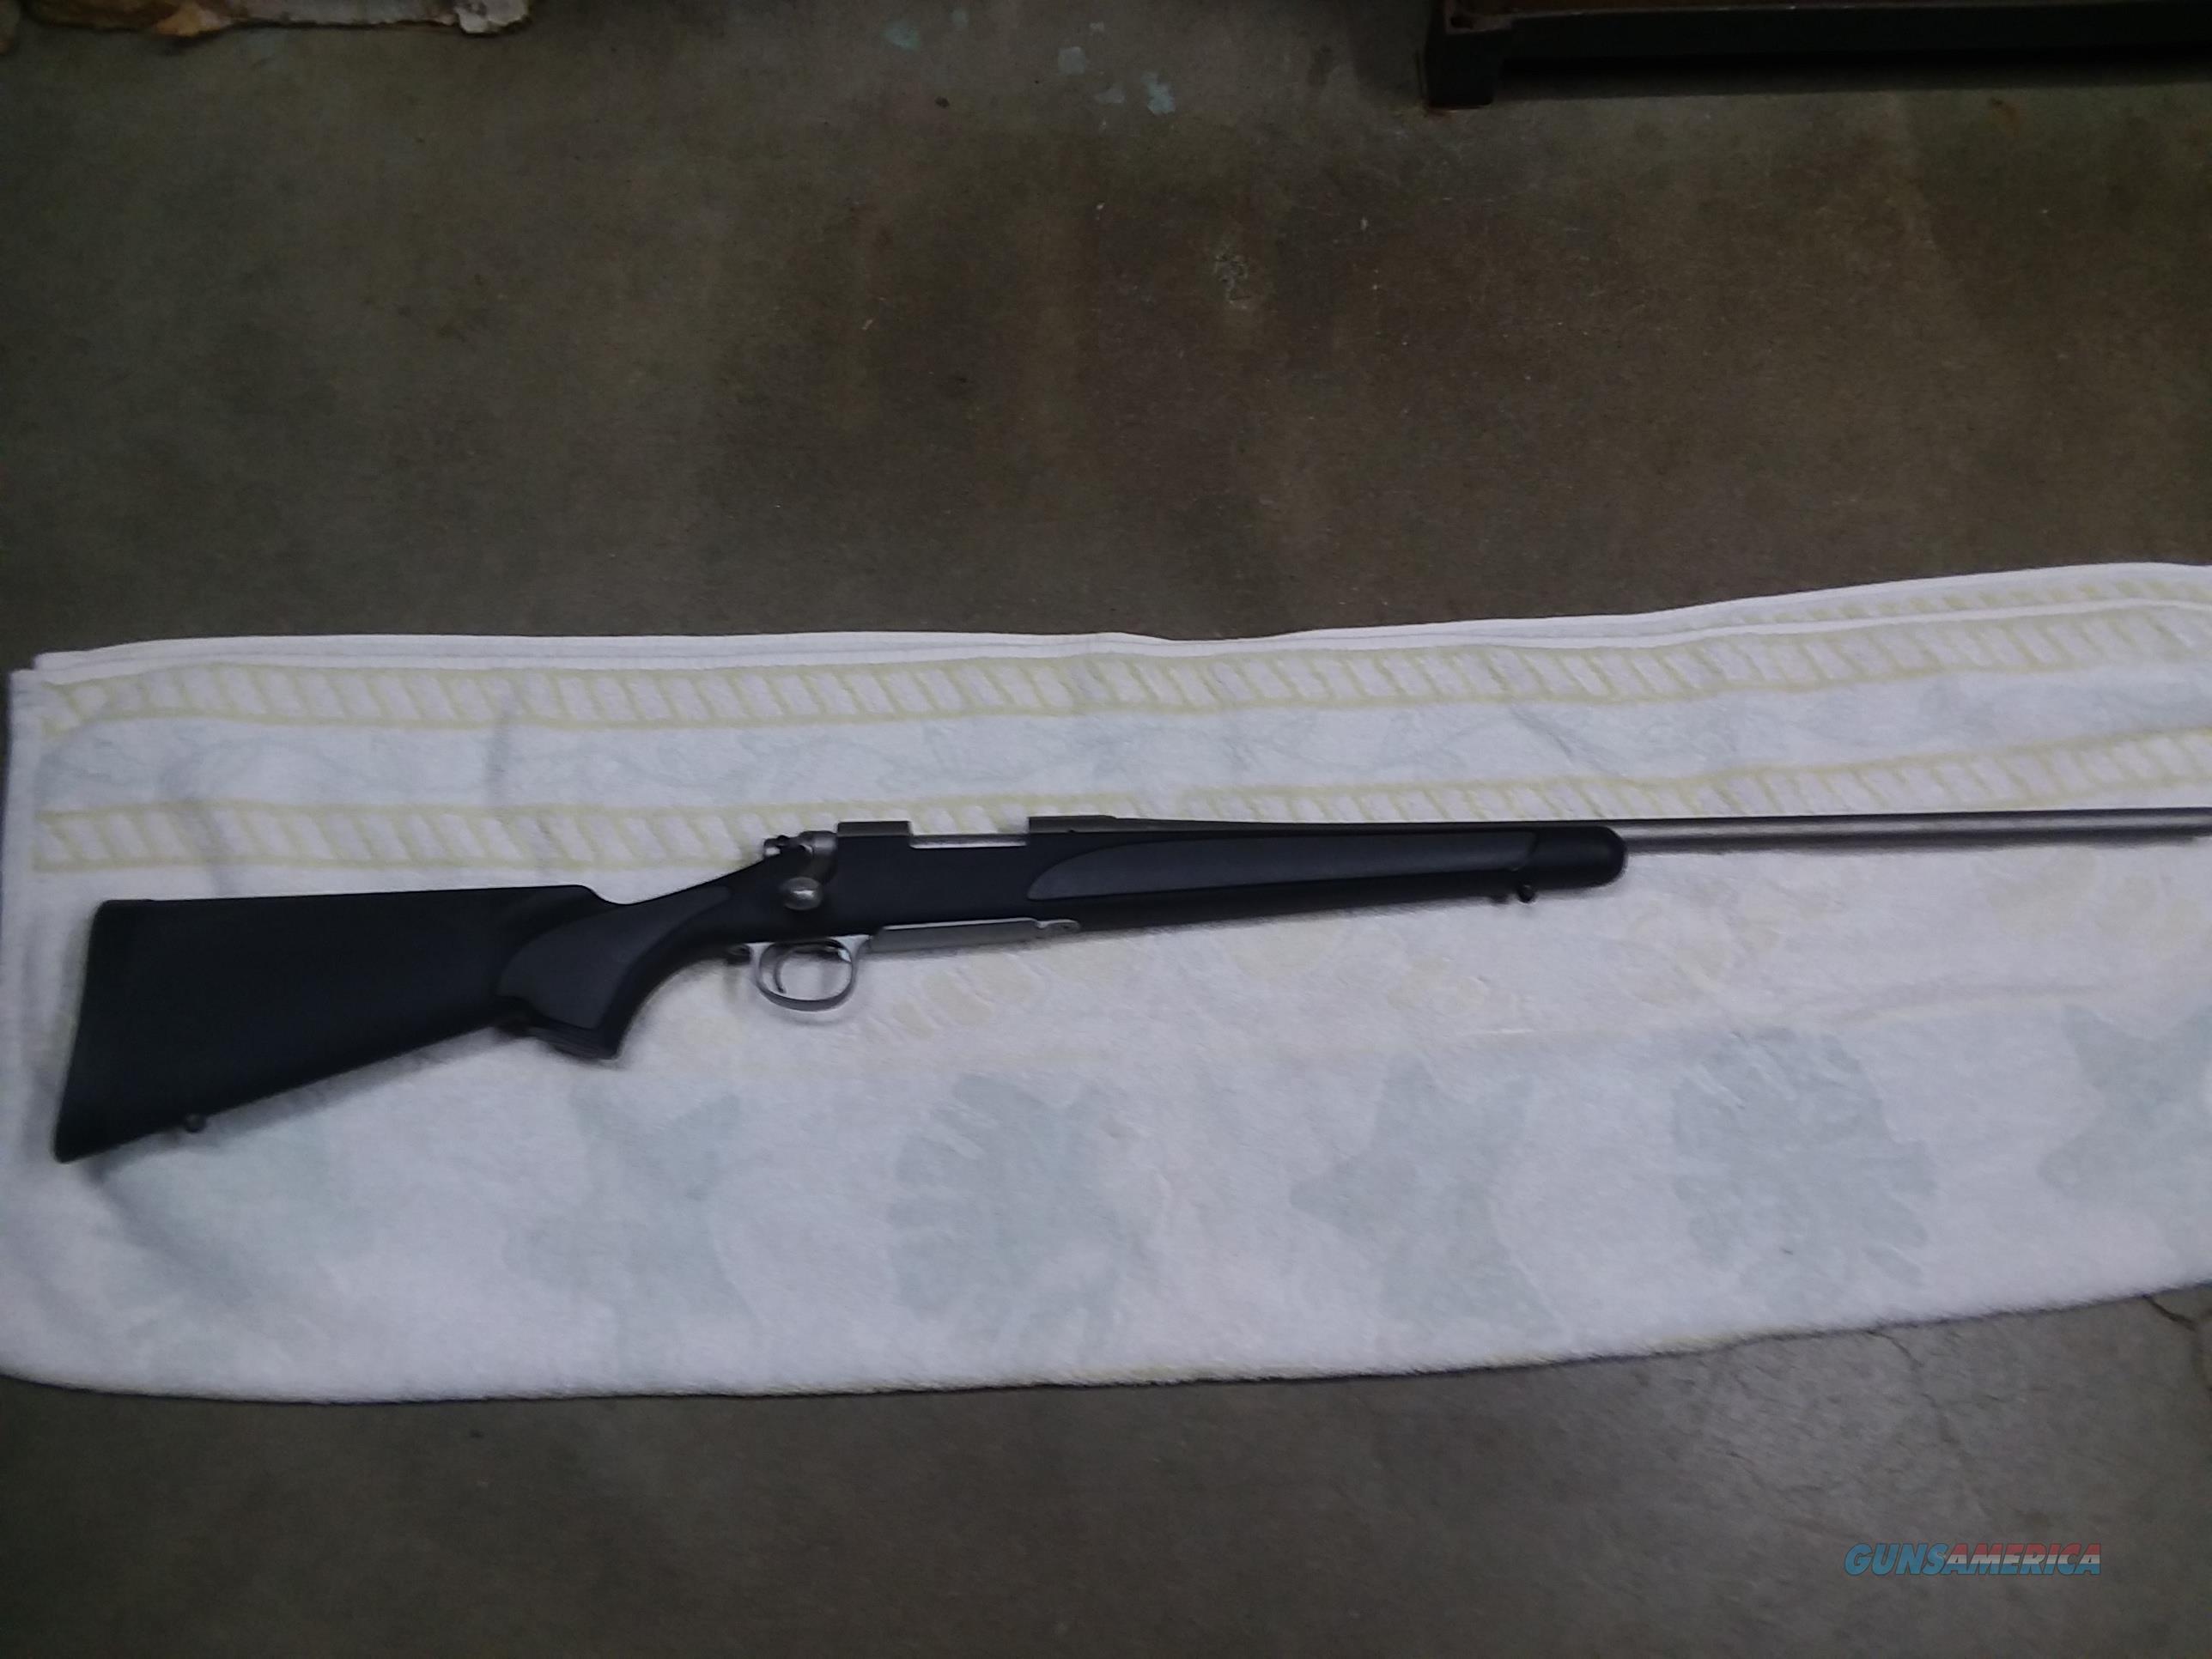 Remington 700 Stainless Synthetic .308  Guns > Rifles > Remington Rifles - Modern > Model 700 > Sporting